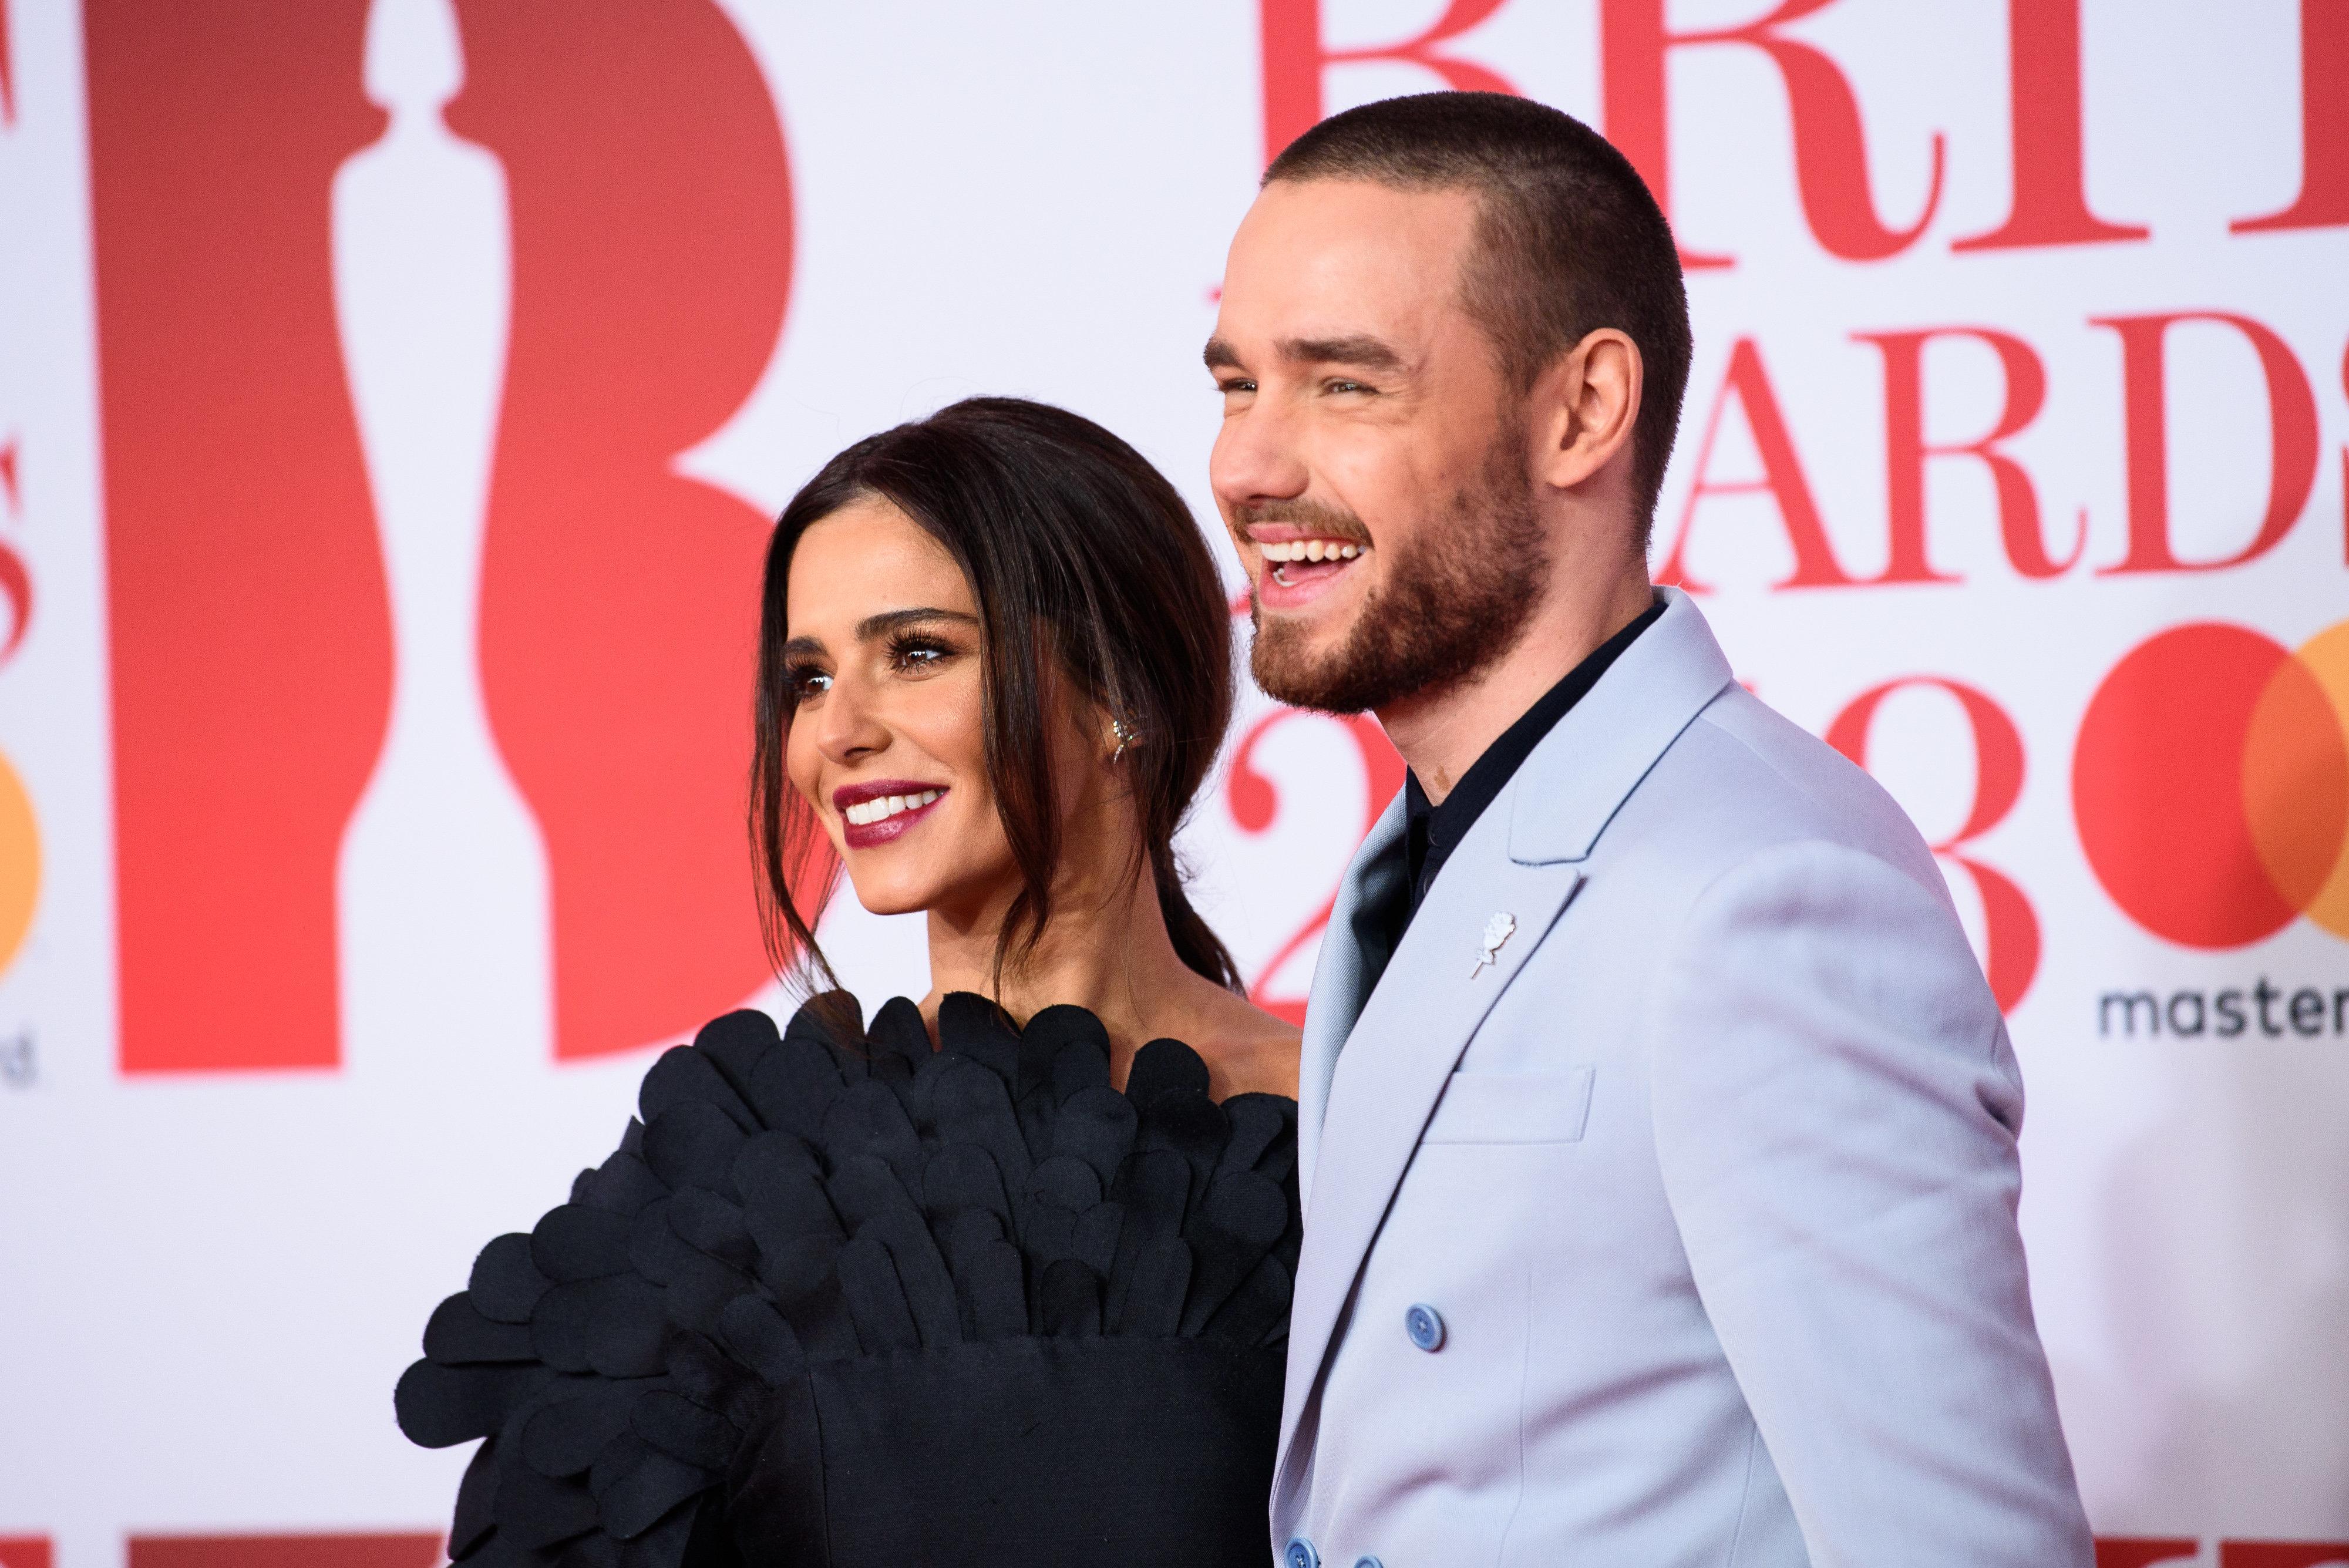 Cheryl Tweedy Releases Second Emotional Statement On Liam Payne Split